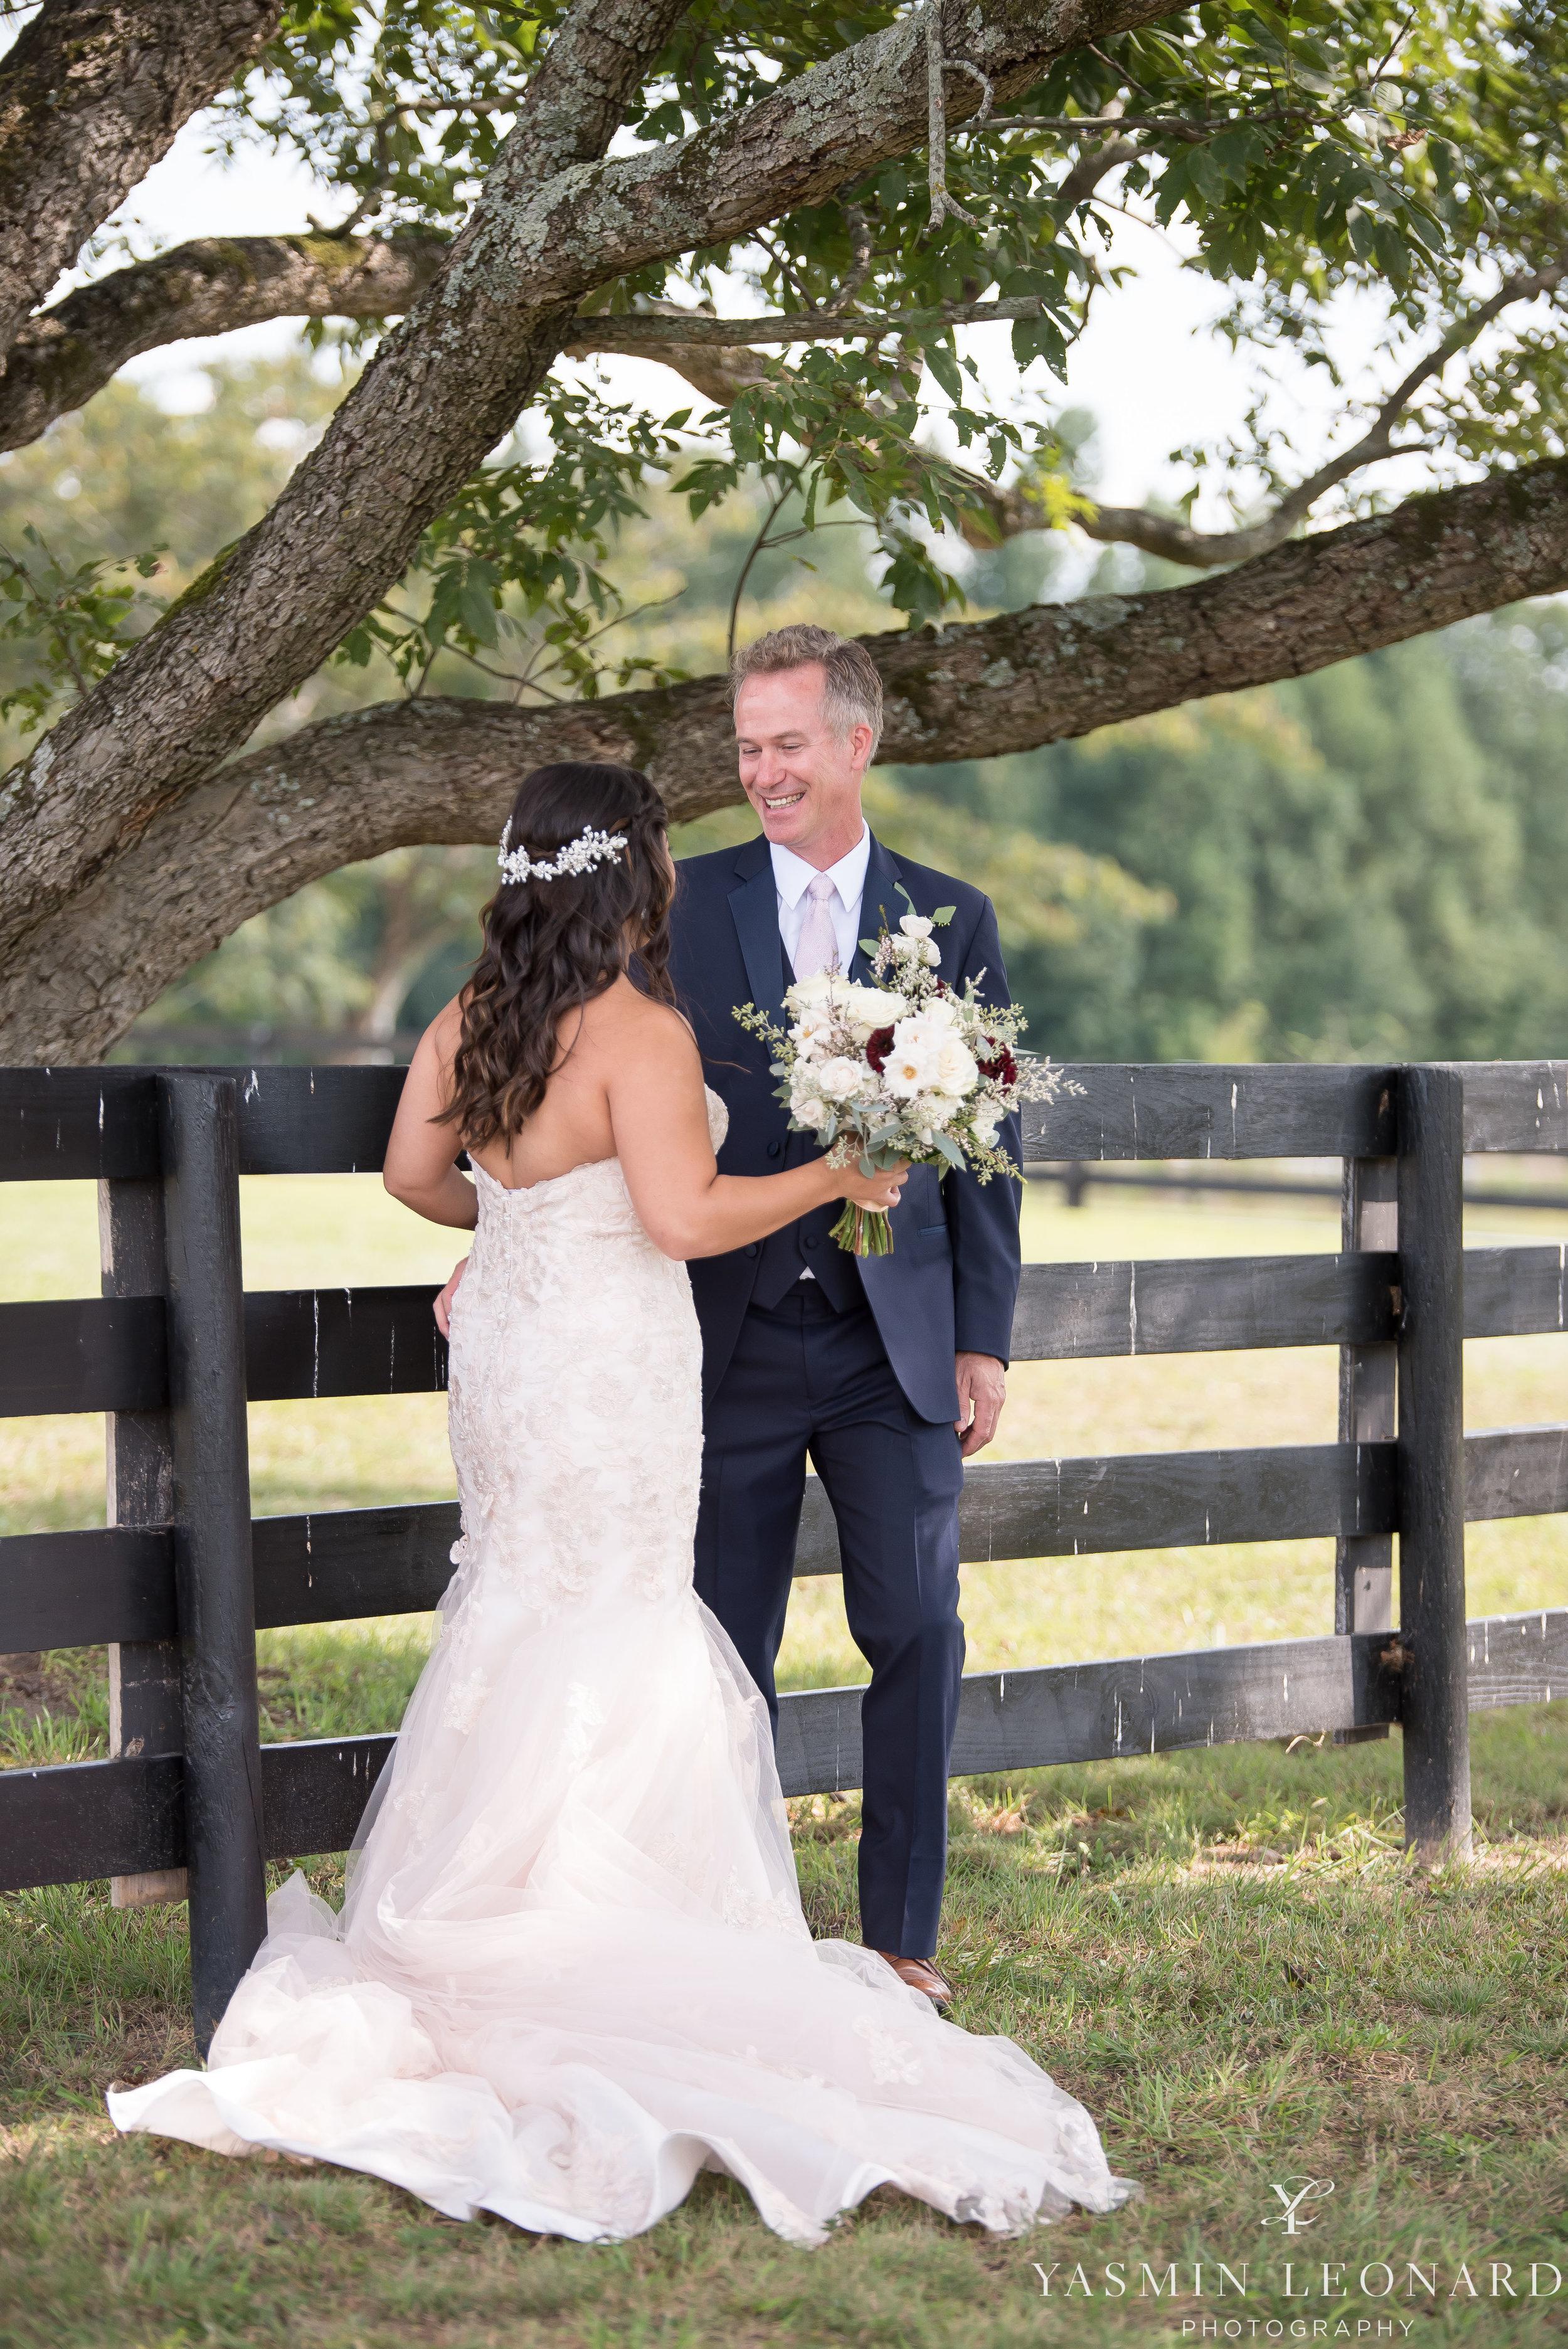 Mason Ridge   Liberty, NC   Aylissa and John   Yasmin Leonard Photography-36.jpg